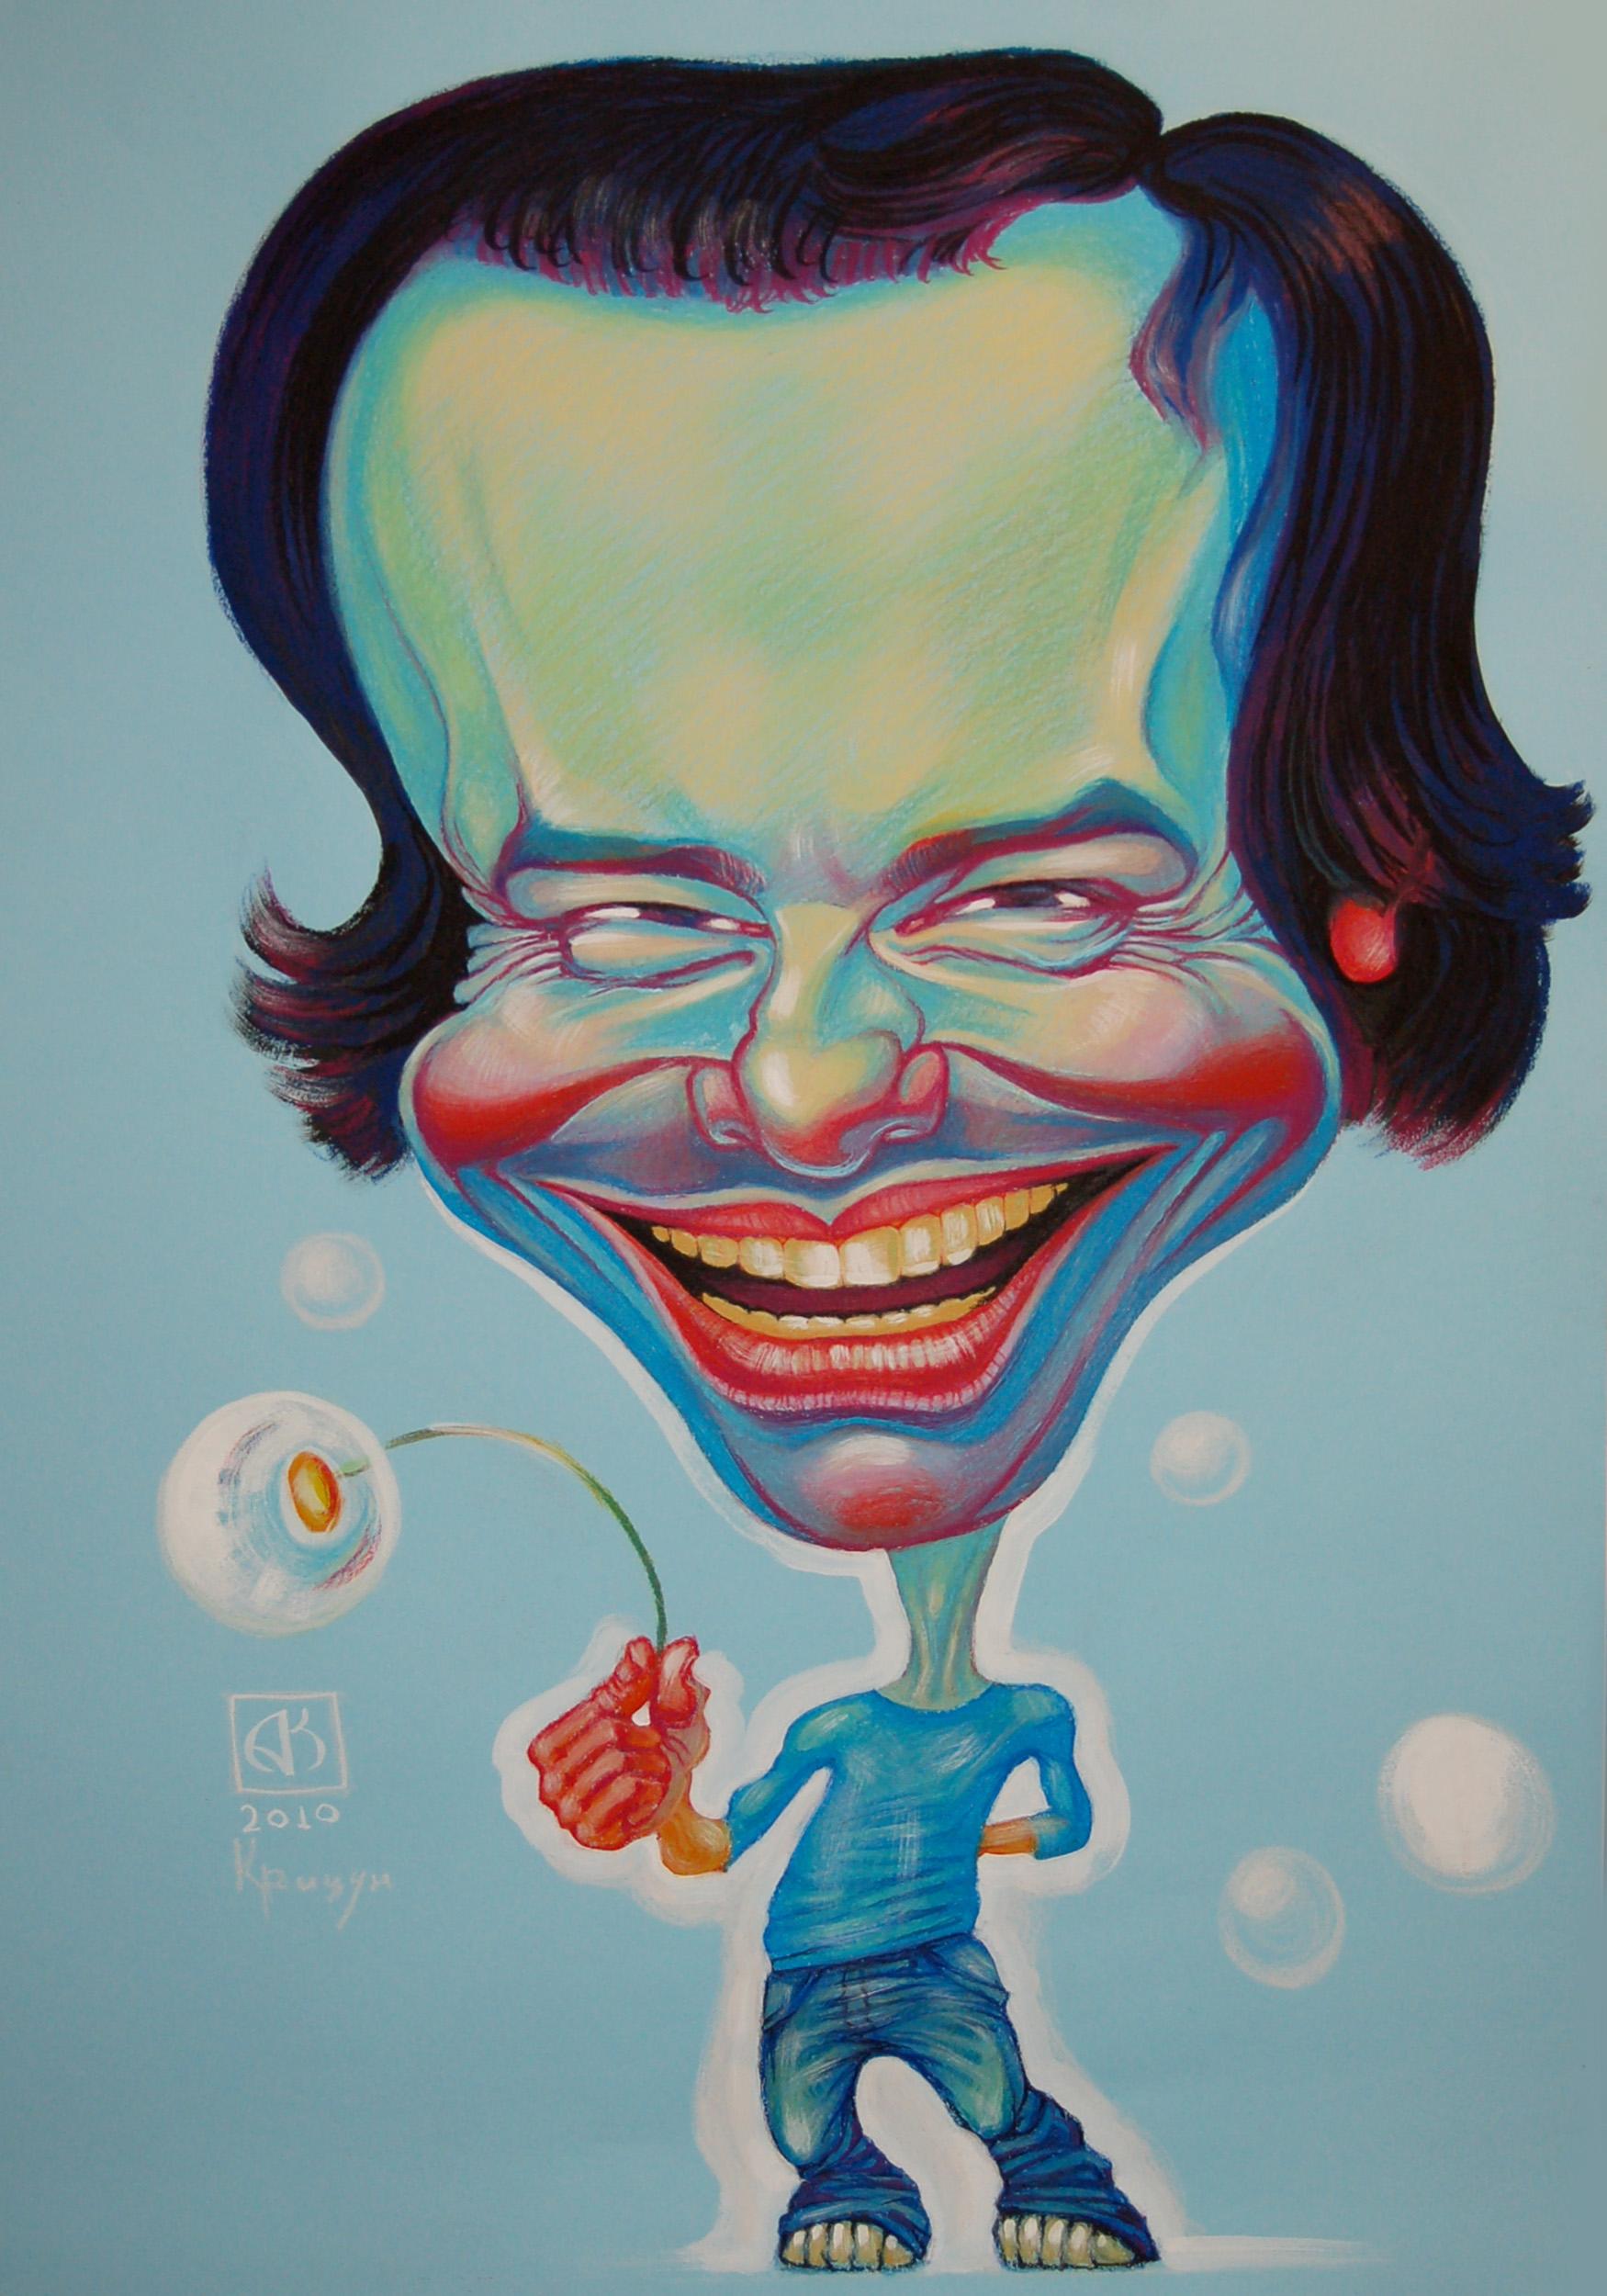 Андрій Крицун. «Слава», 2010; папір, олійна пастель, 100х70